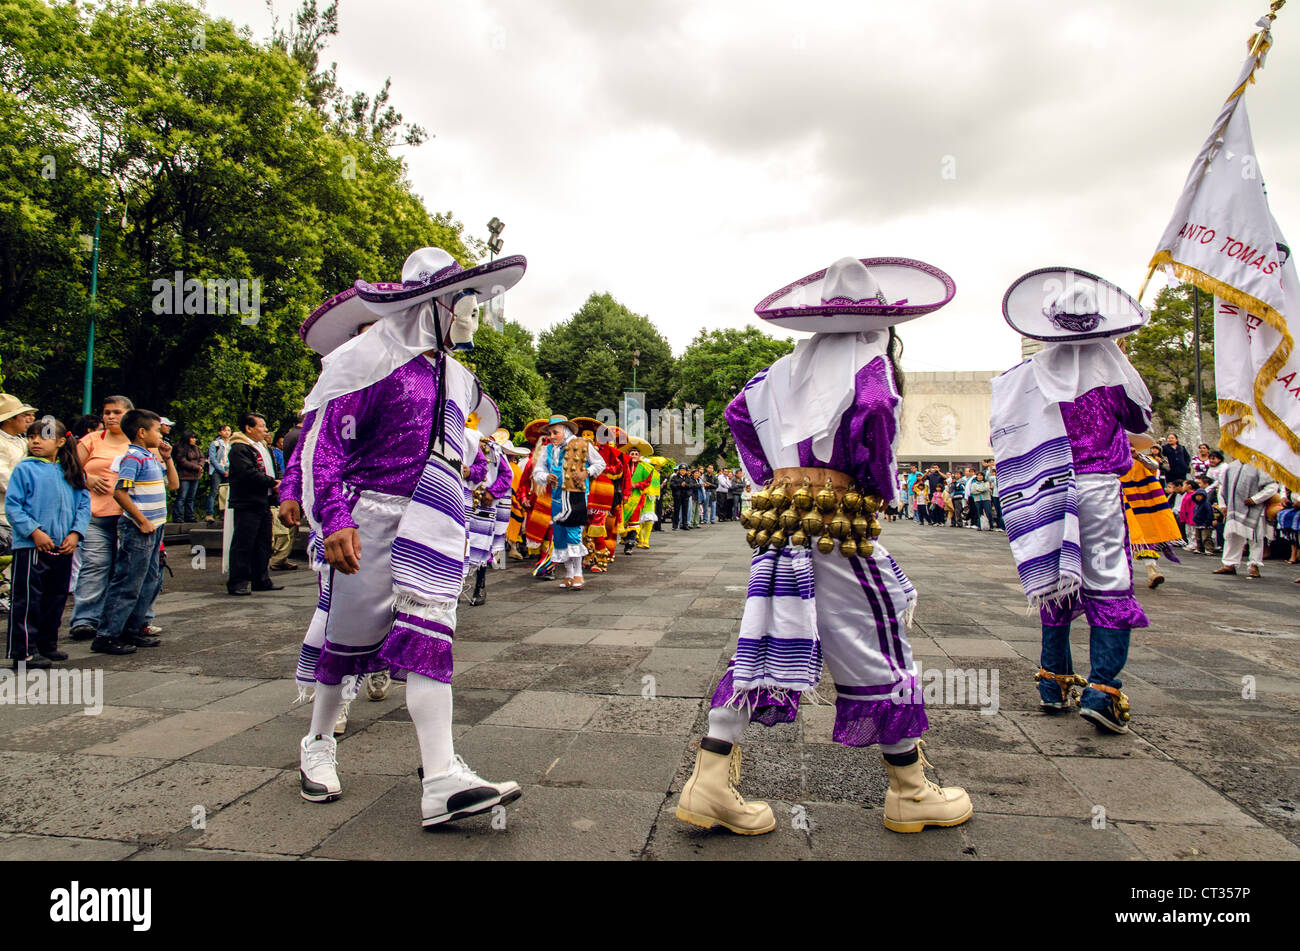 Traditional Mexican Sombreros Mexico City Mexico Central America - Stock Image